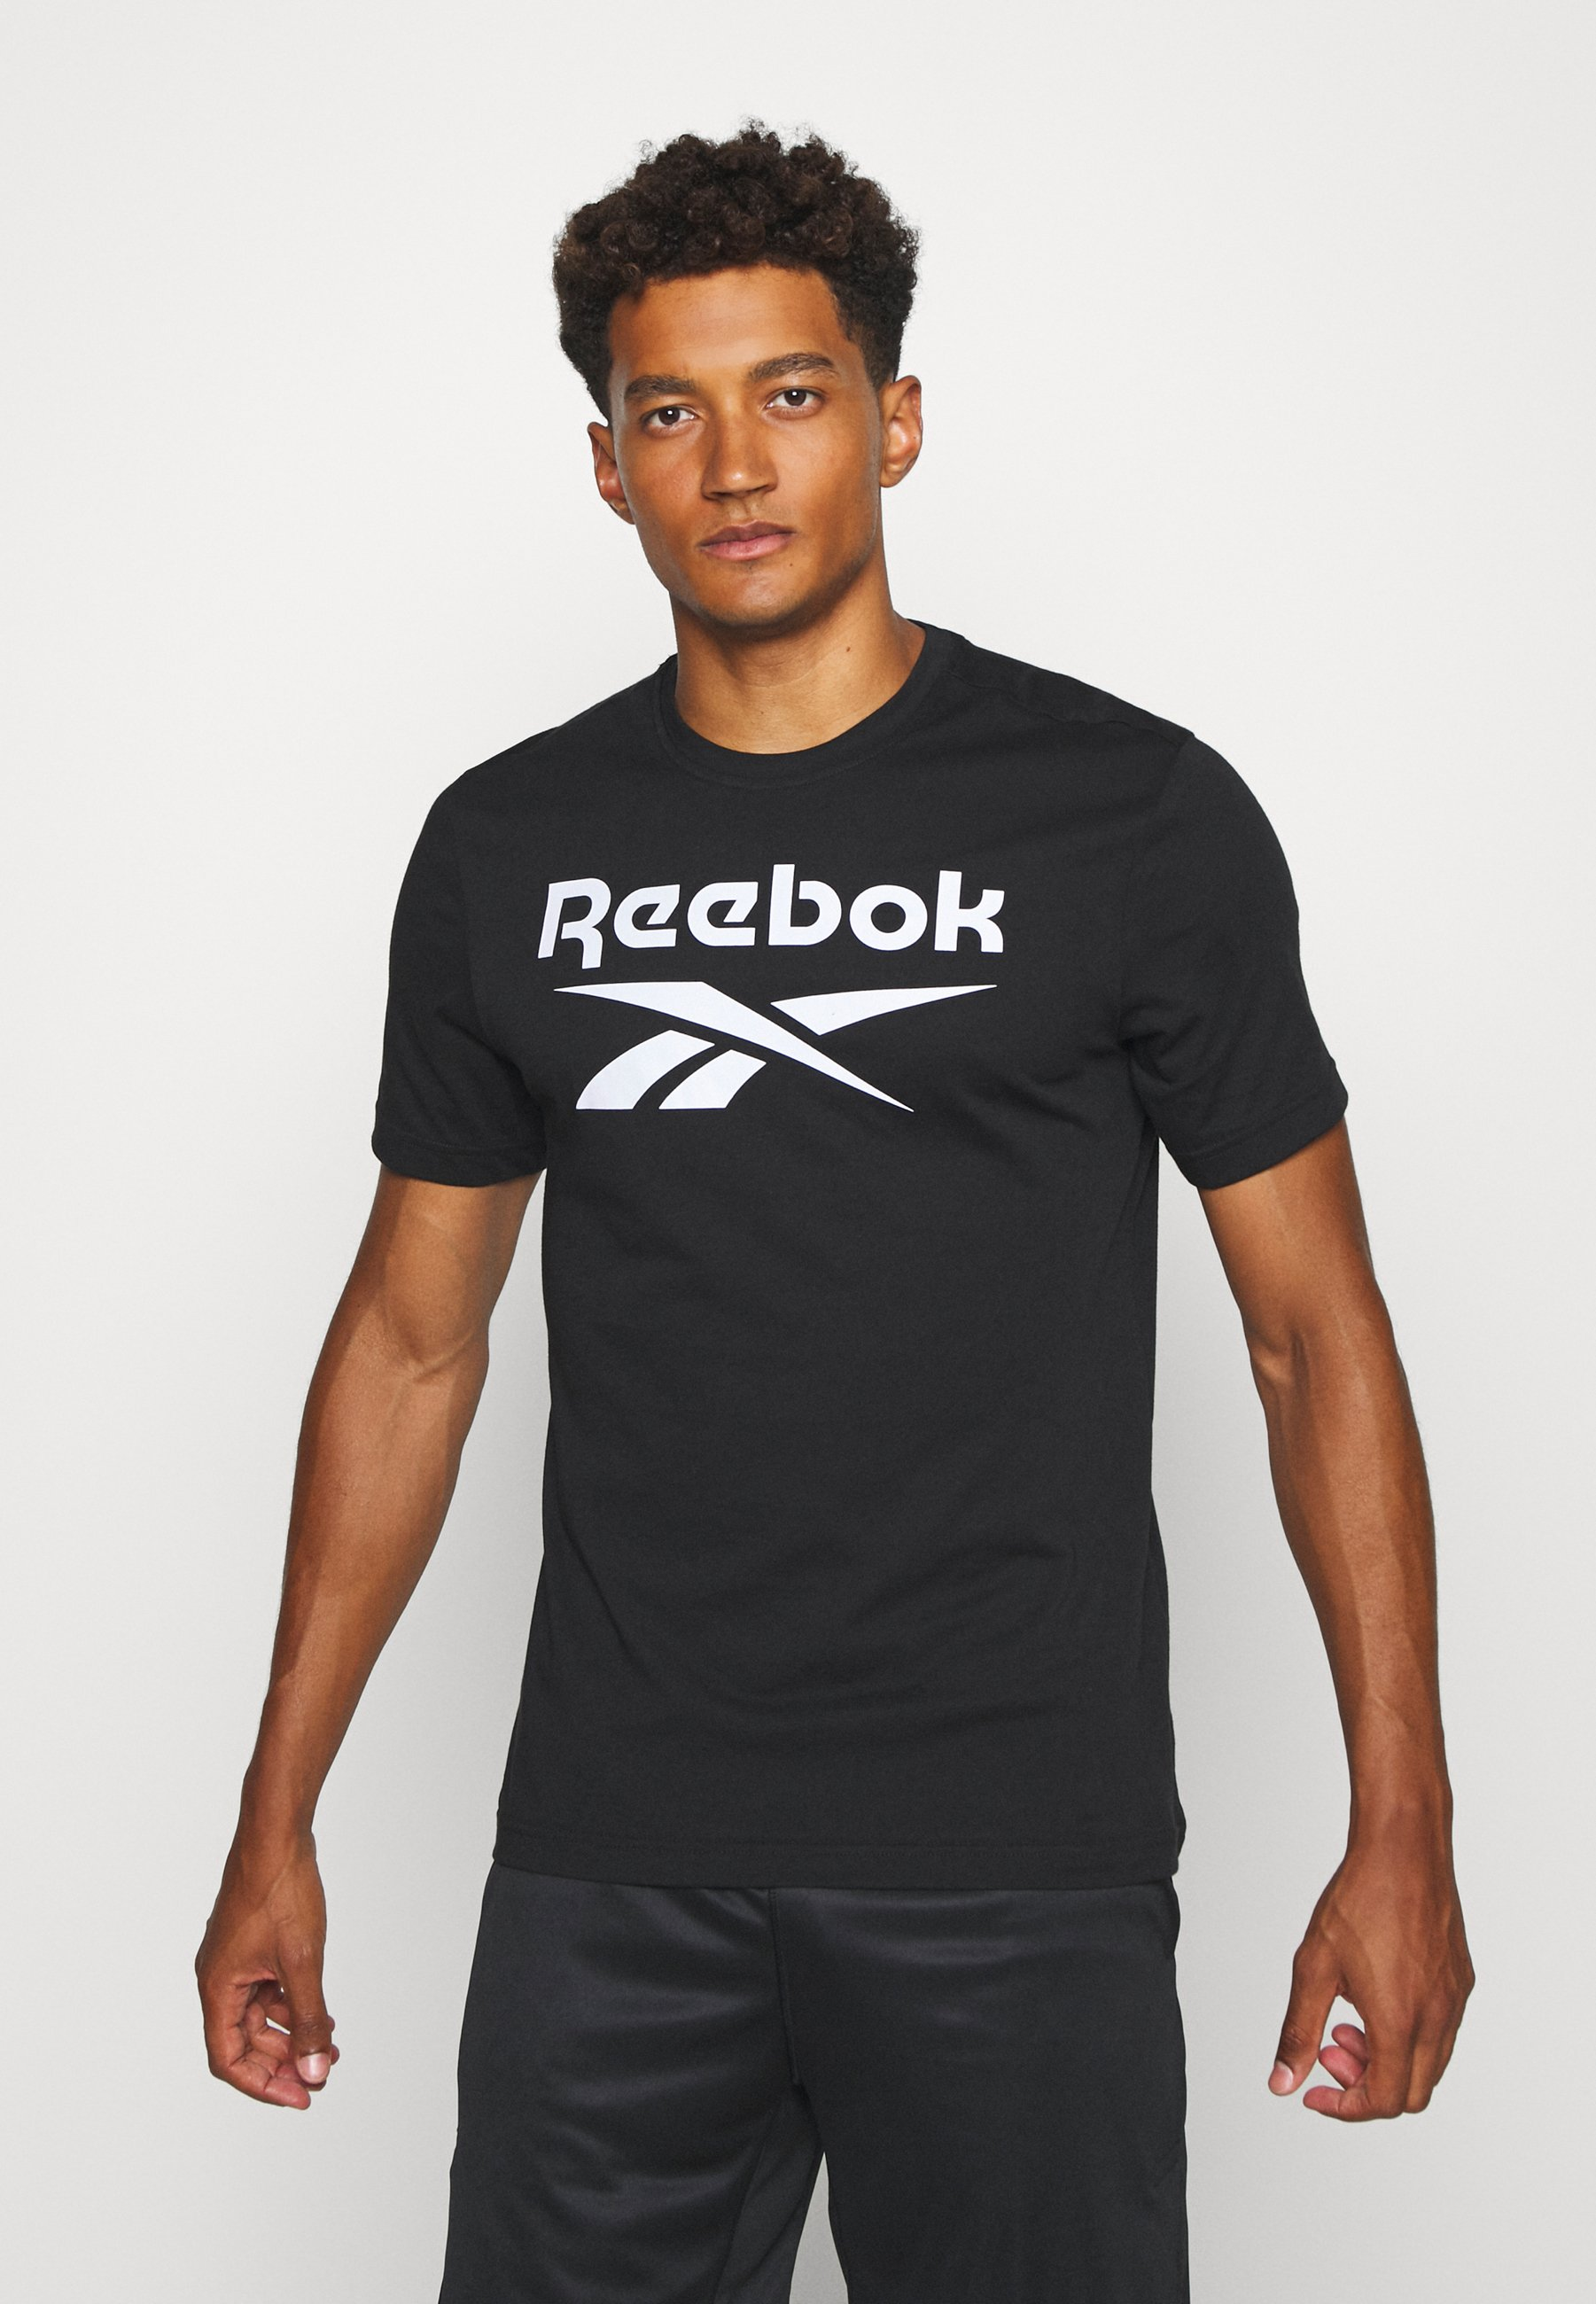 Reebok Online Shop | Reebok online bestellen bei Zalando